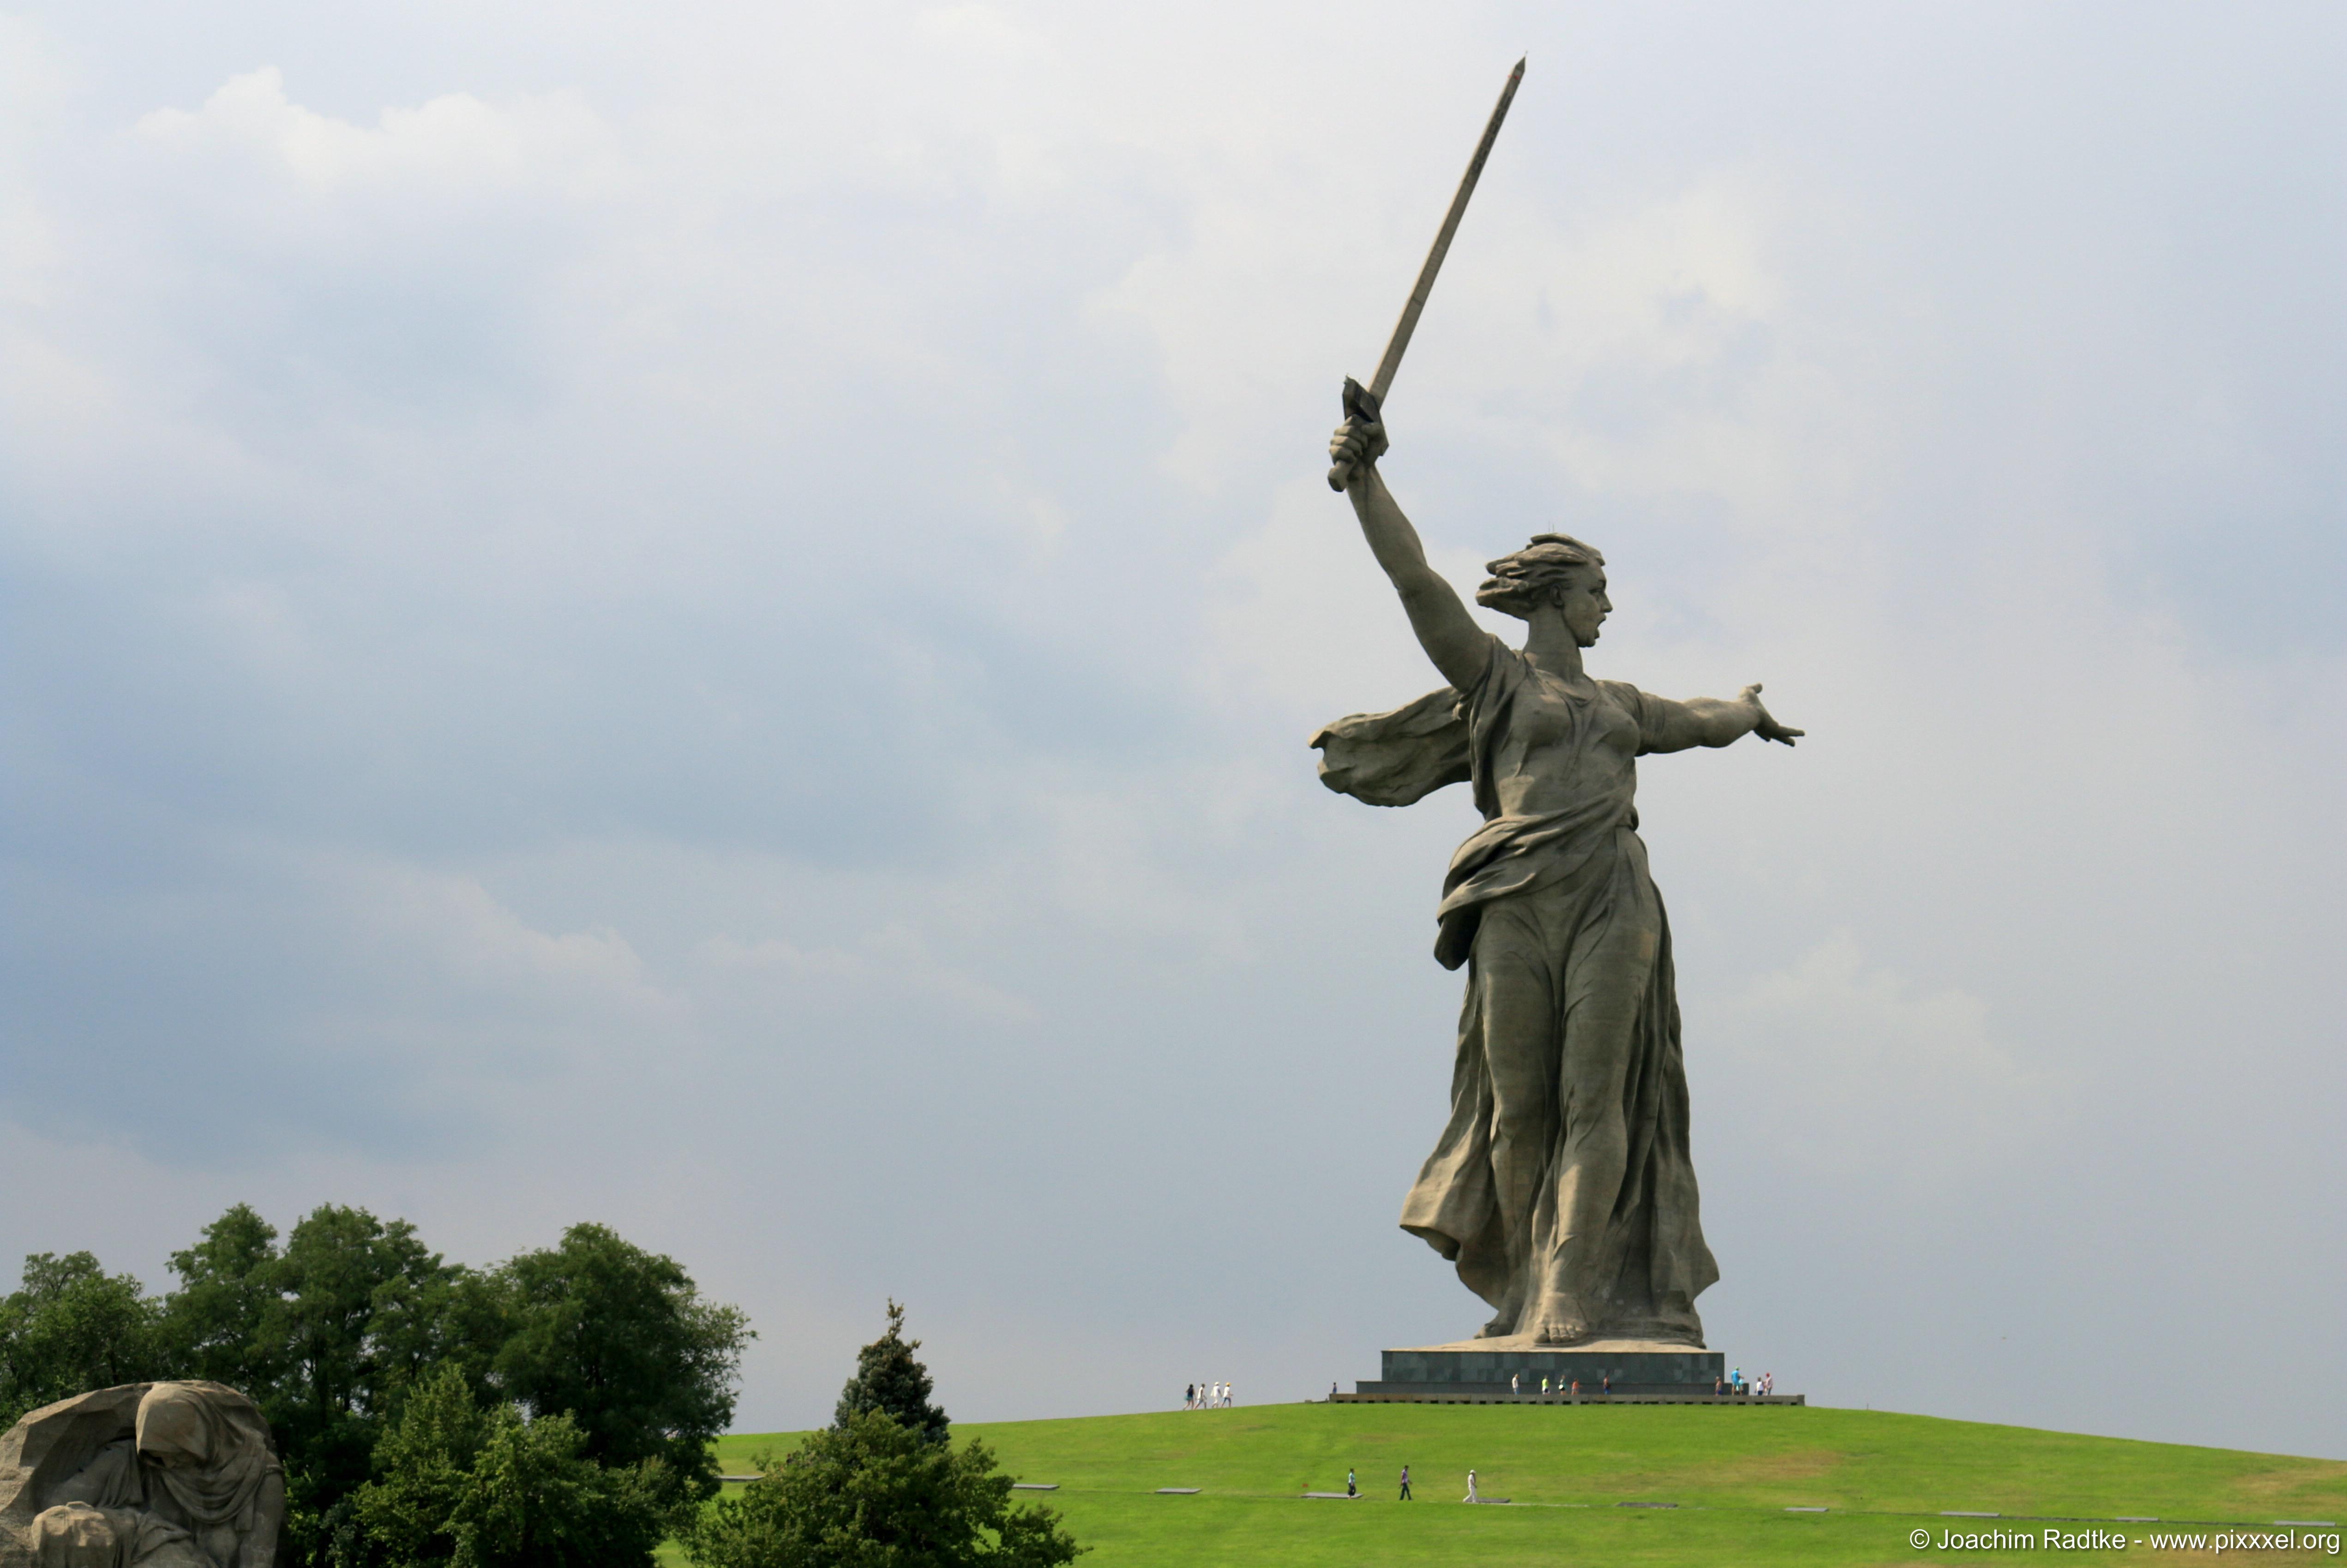 http://pixxxeldotorg.files.wordpress.com/2014/11/mamaev-kurgan-wolgograd-56.jpg